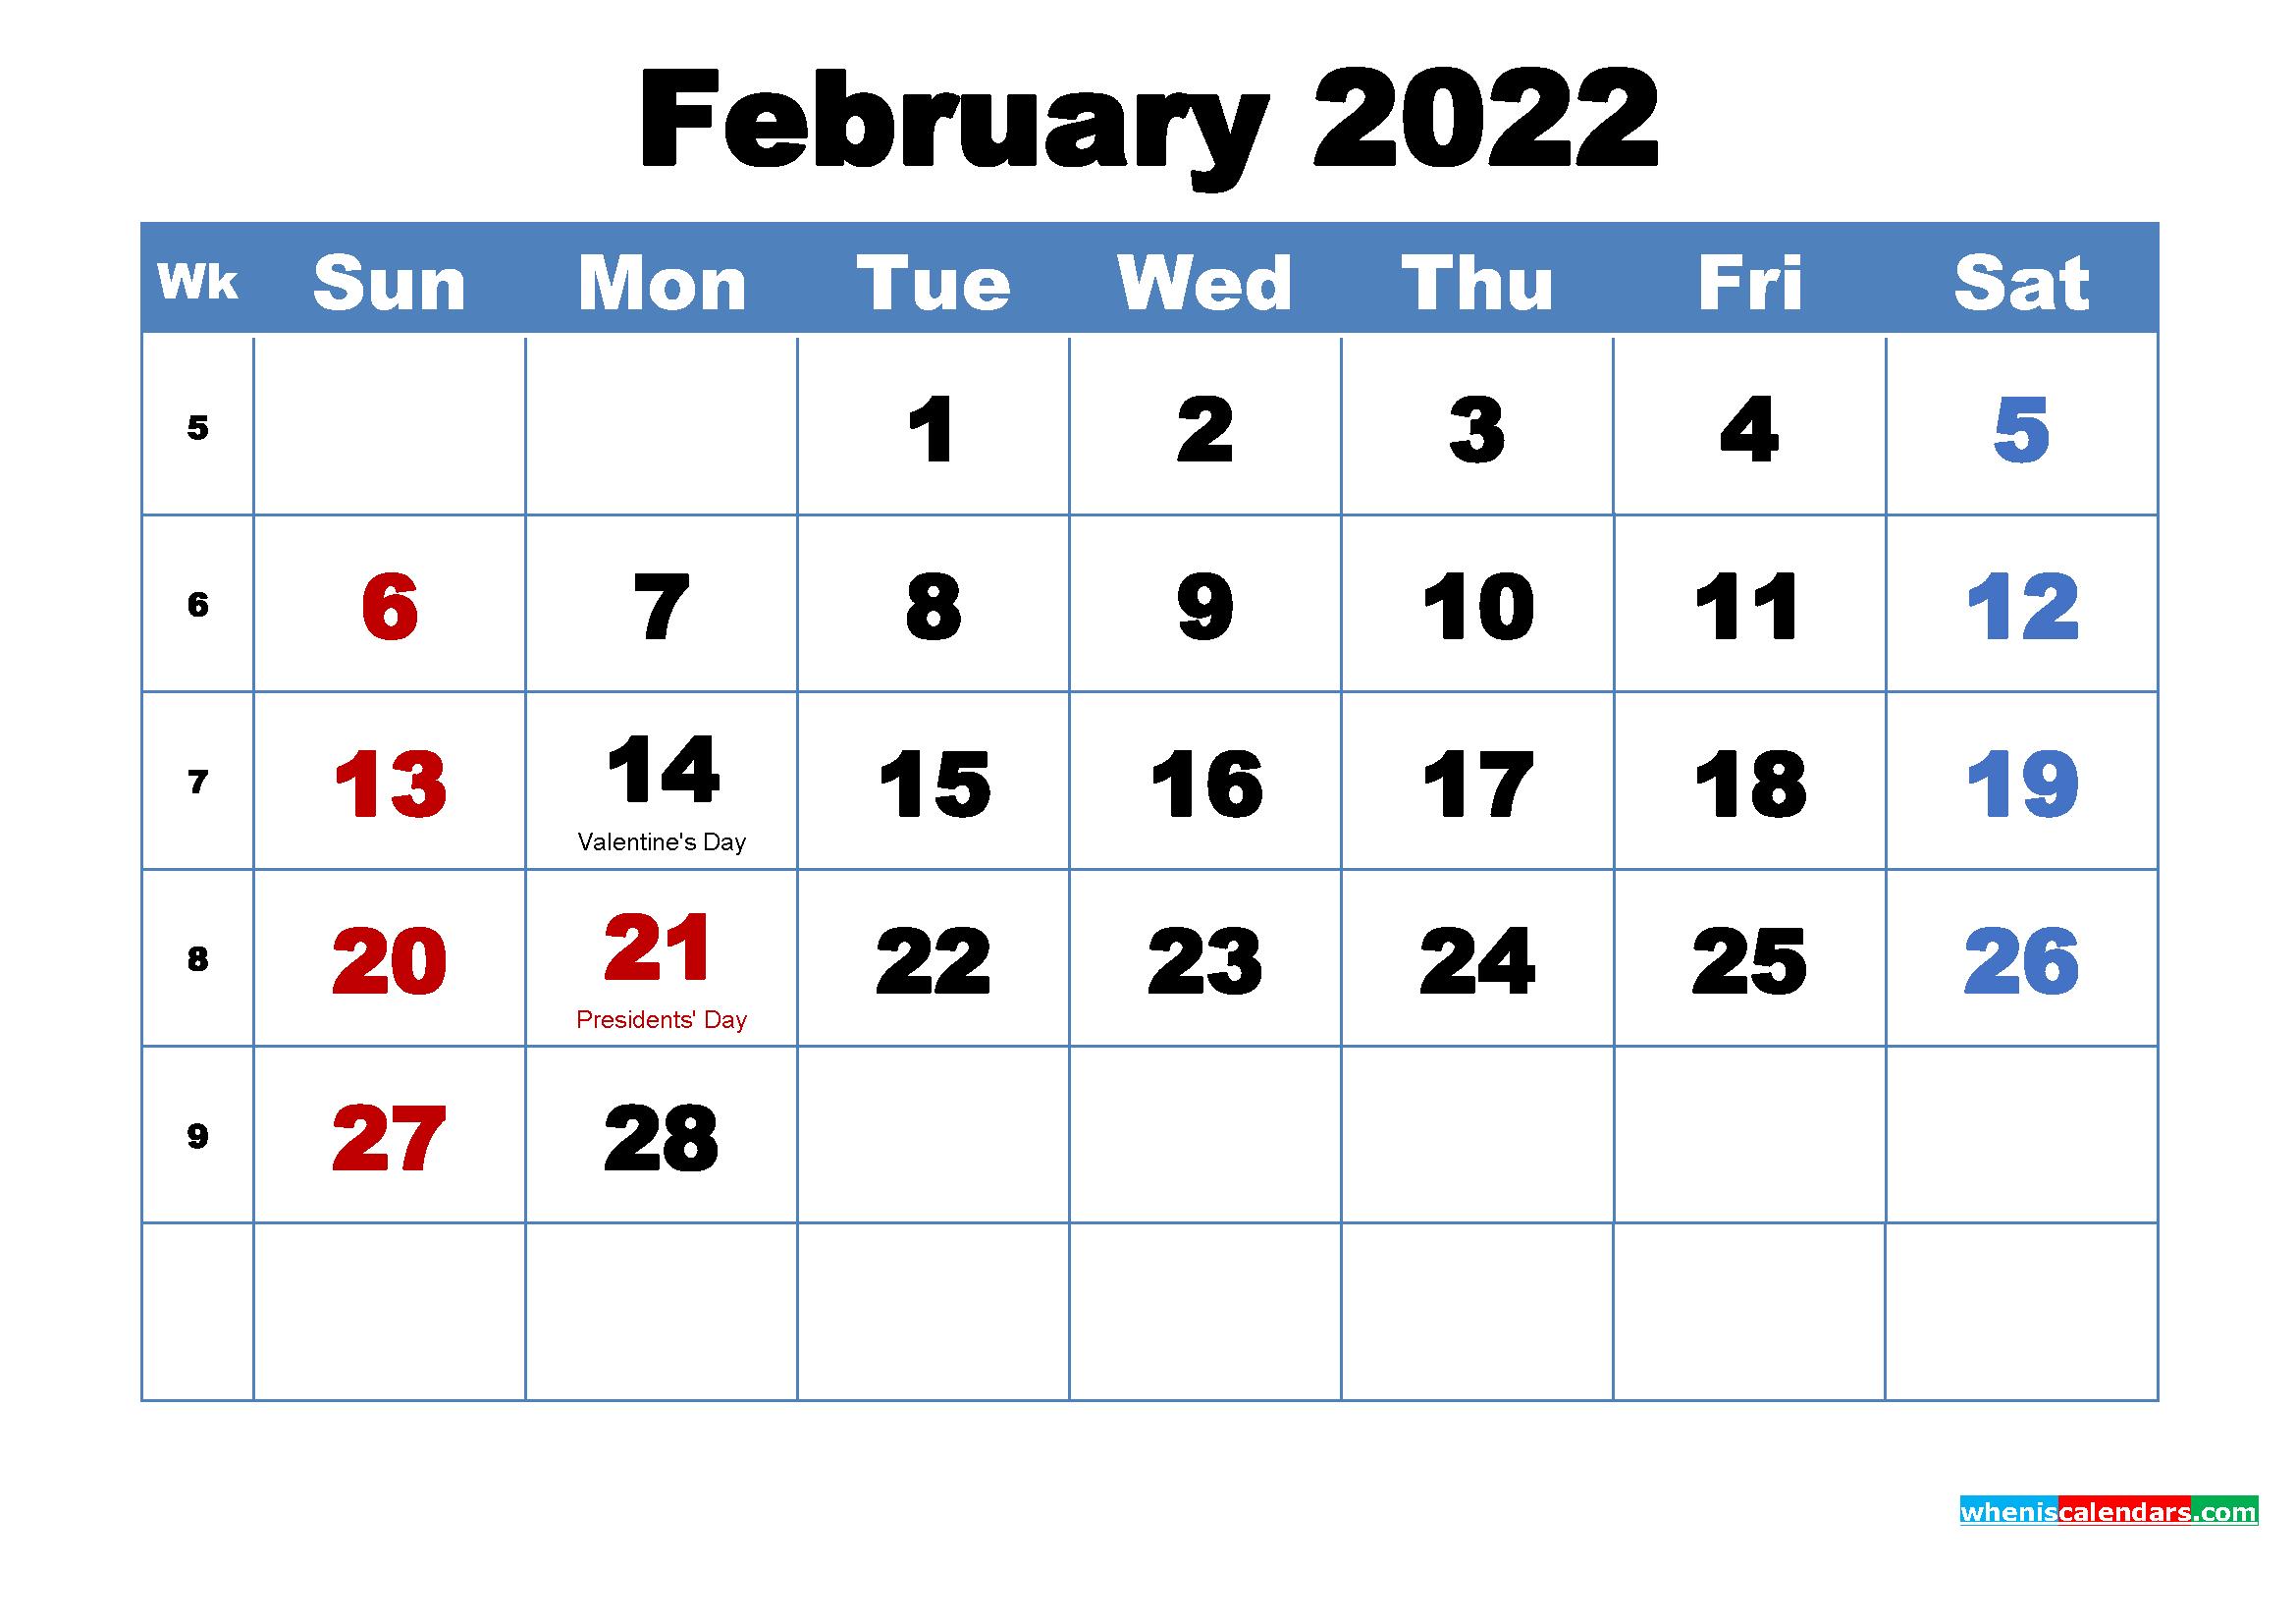 Printable 2022 Calendar by Month February